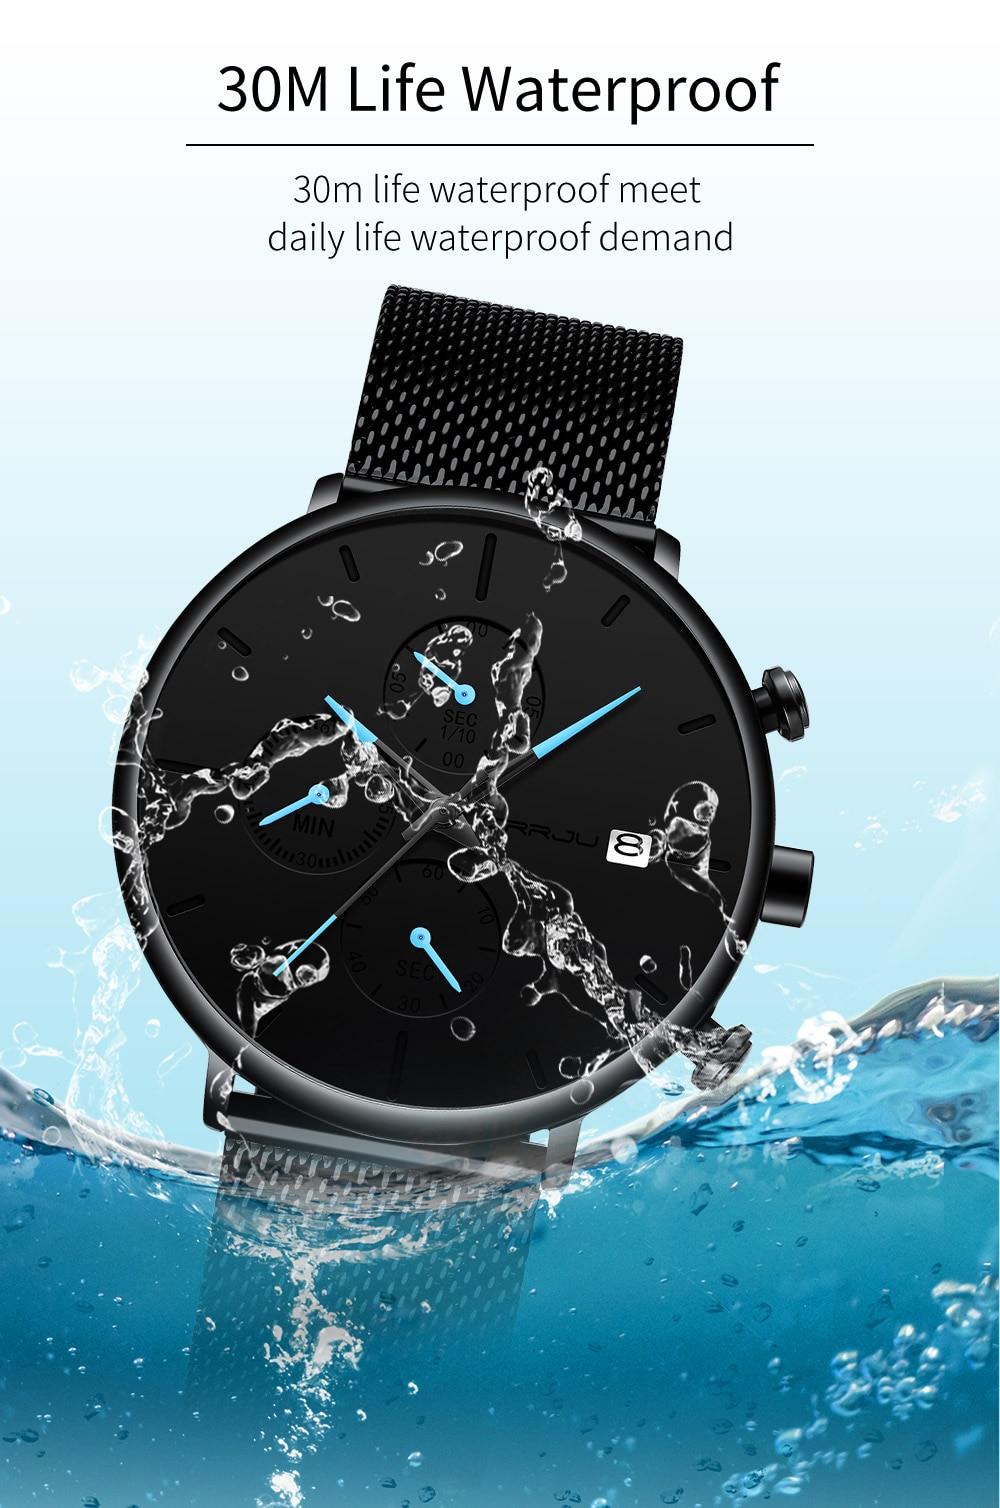 HTB1z7ceVrrpK1RjSZTEq6AWAVXa4 Mens Women StopWatches CRRJU Unique Design Luxury Sport Wrist Watch Stainless Steel Mesh Strap Men's Fashion Casual Date Watches